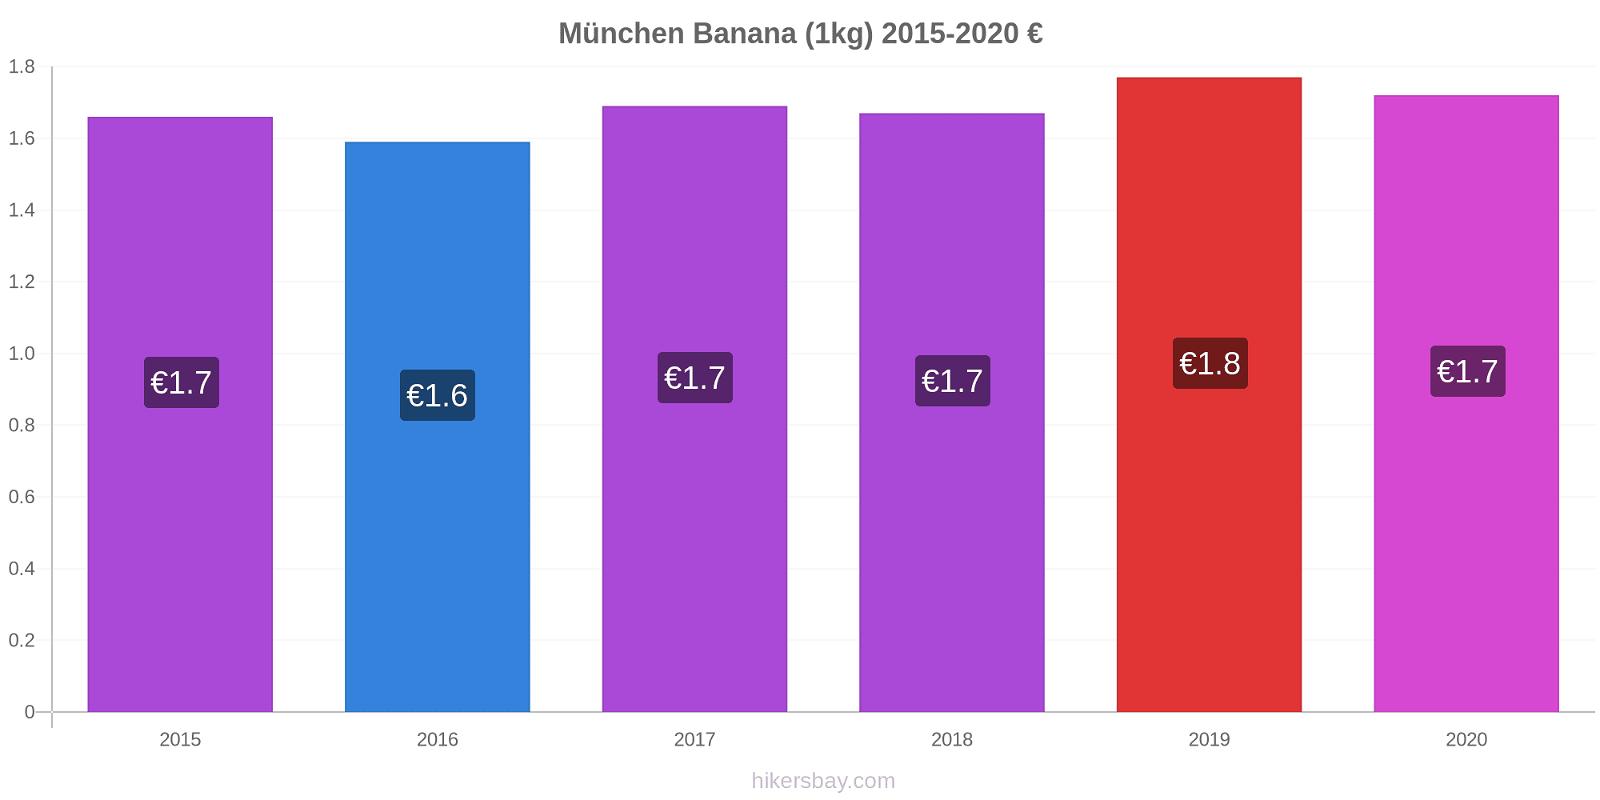 München modificări de preț Banana (1kg) hikersbay.com